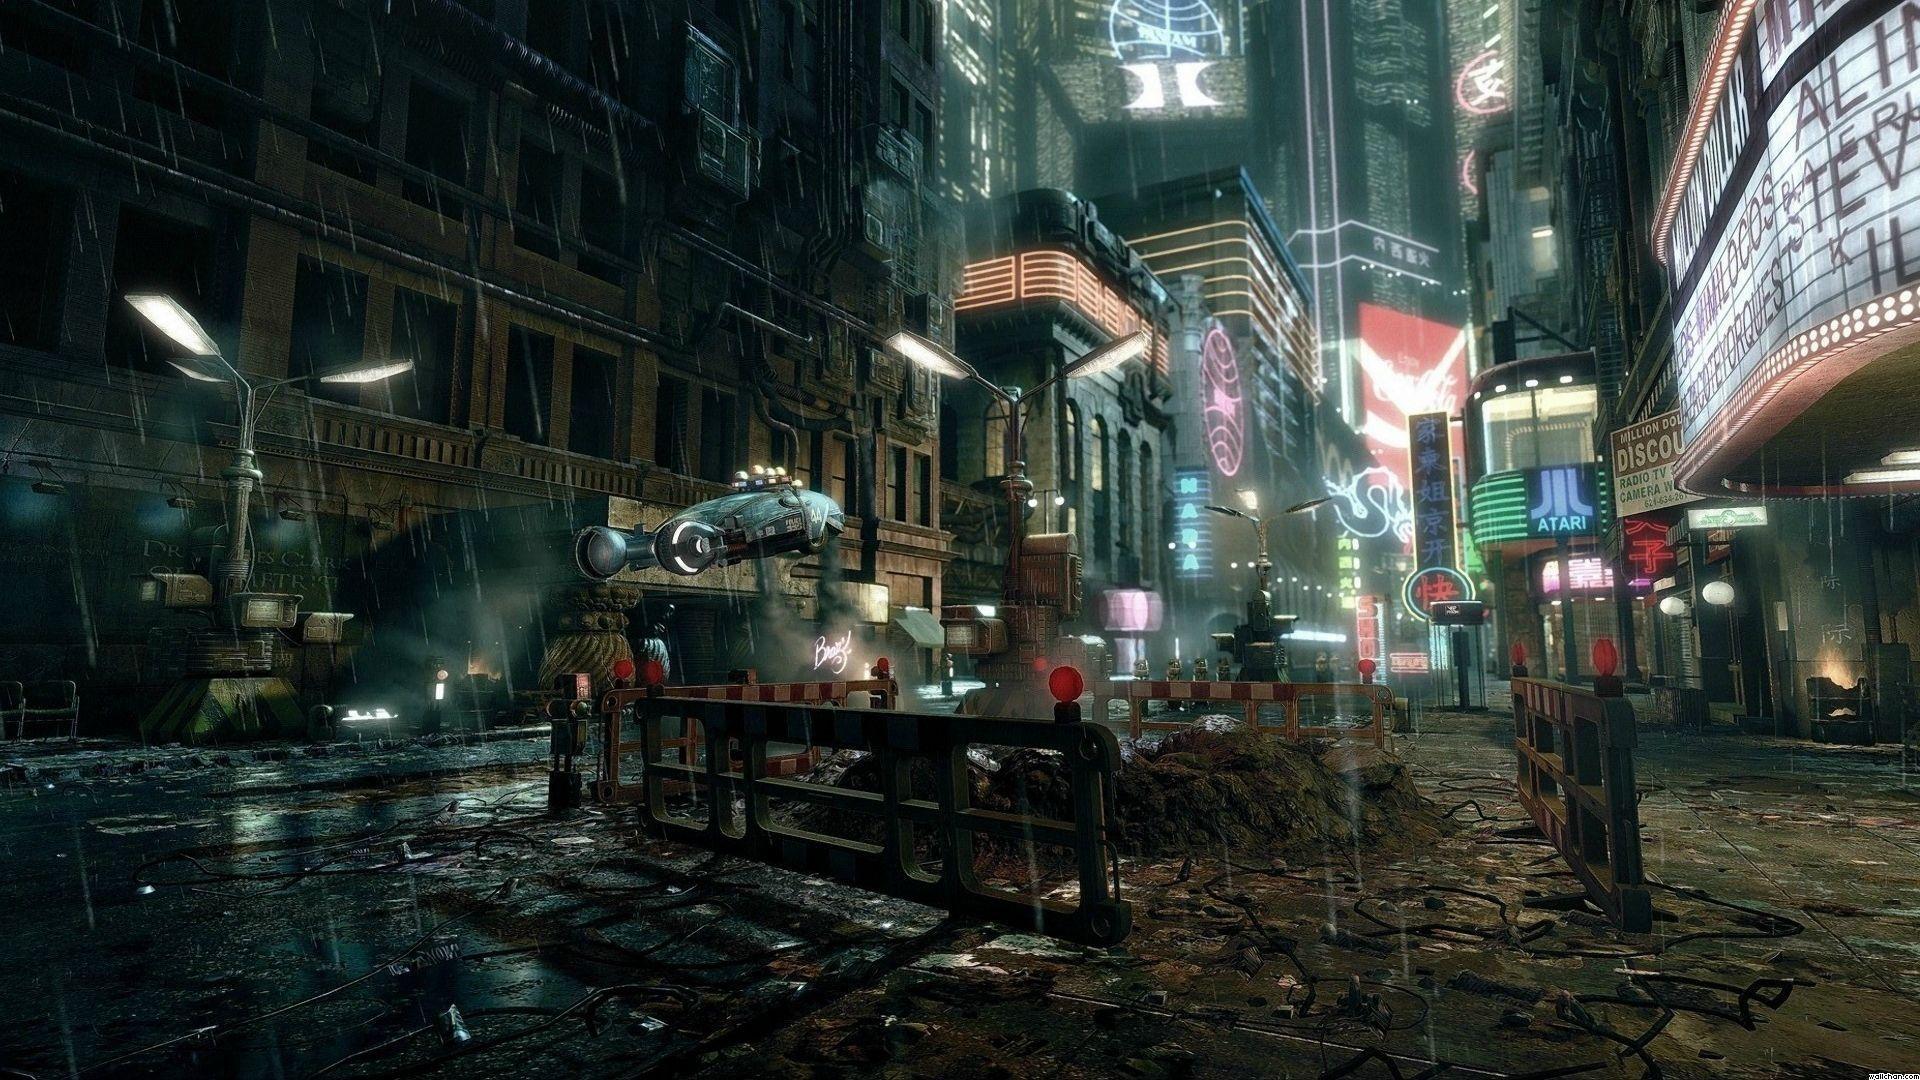 futuristic cities Cyberpunk 2077 - Wallpaper (#2719185) / Wallbase.cc | Cyberpunk city, Futuristic city, Sci fi city